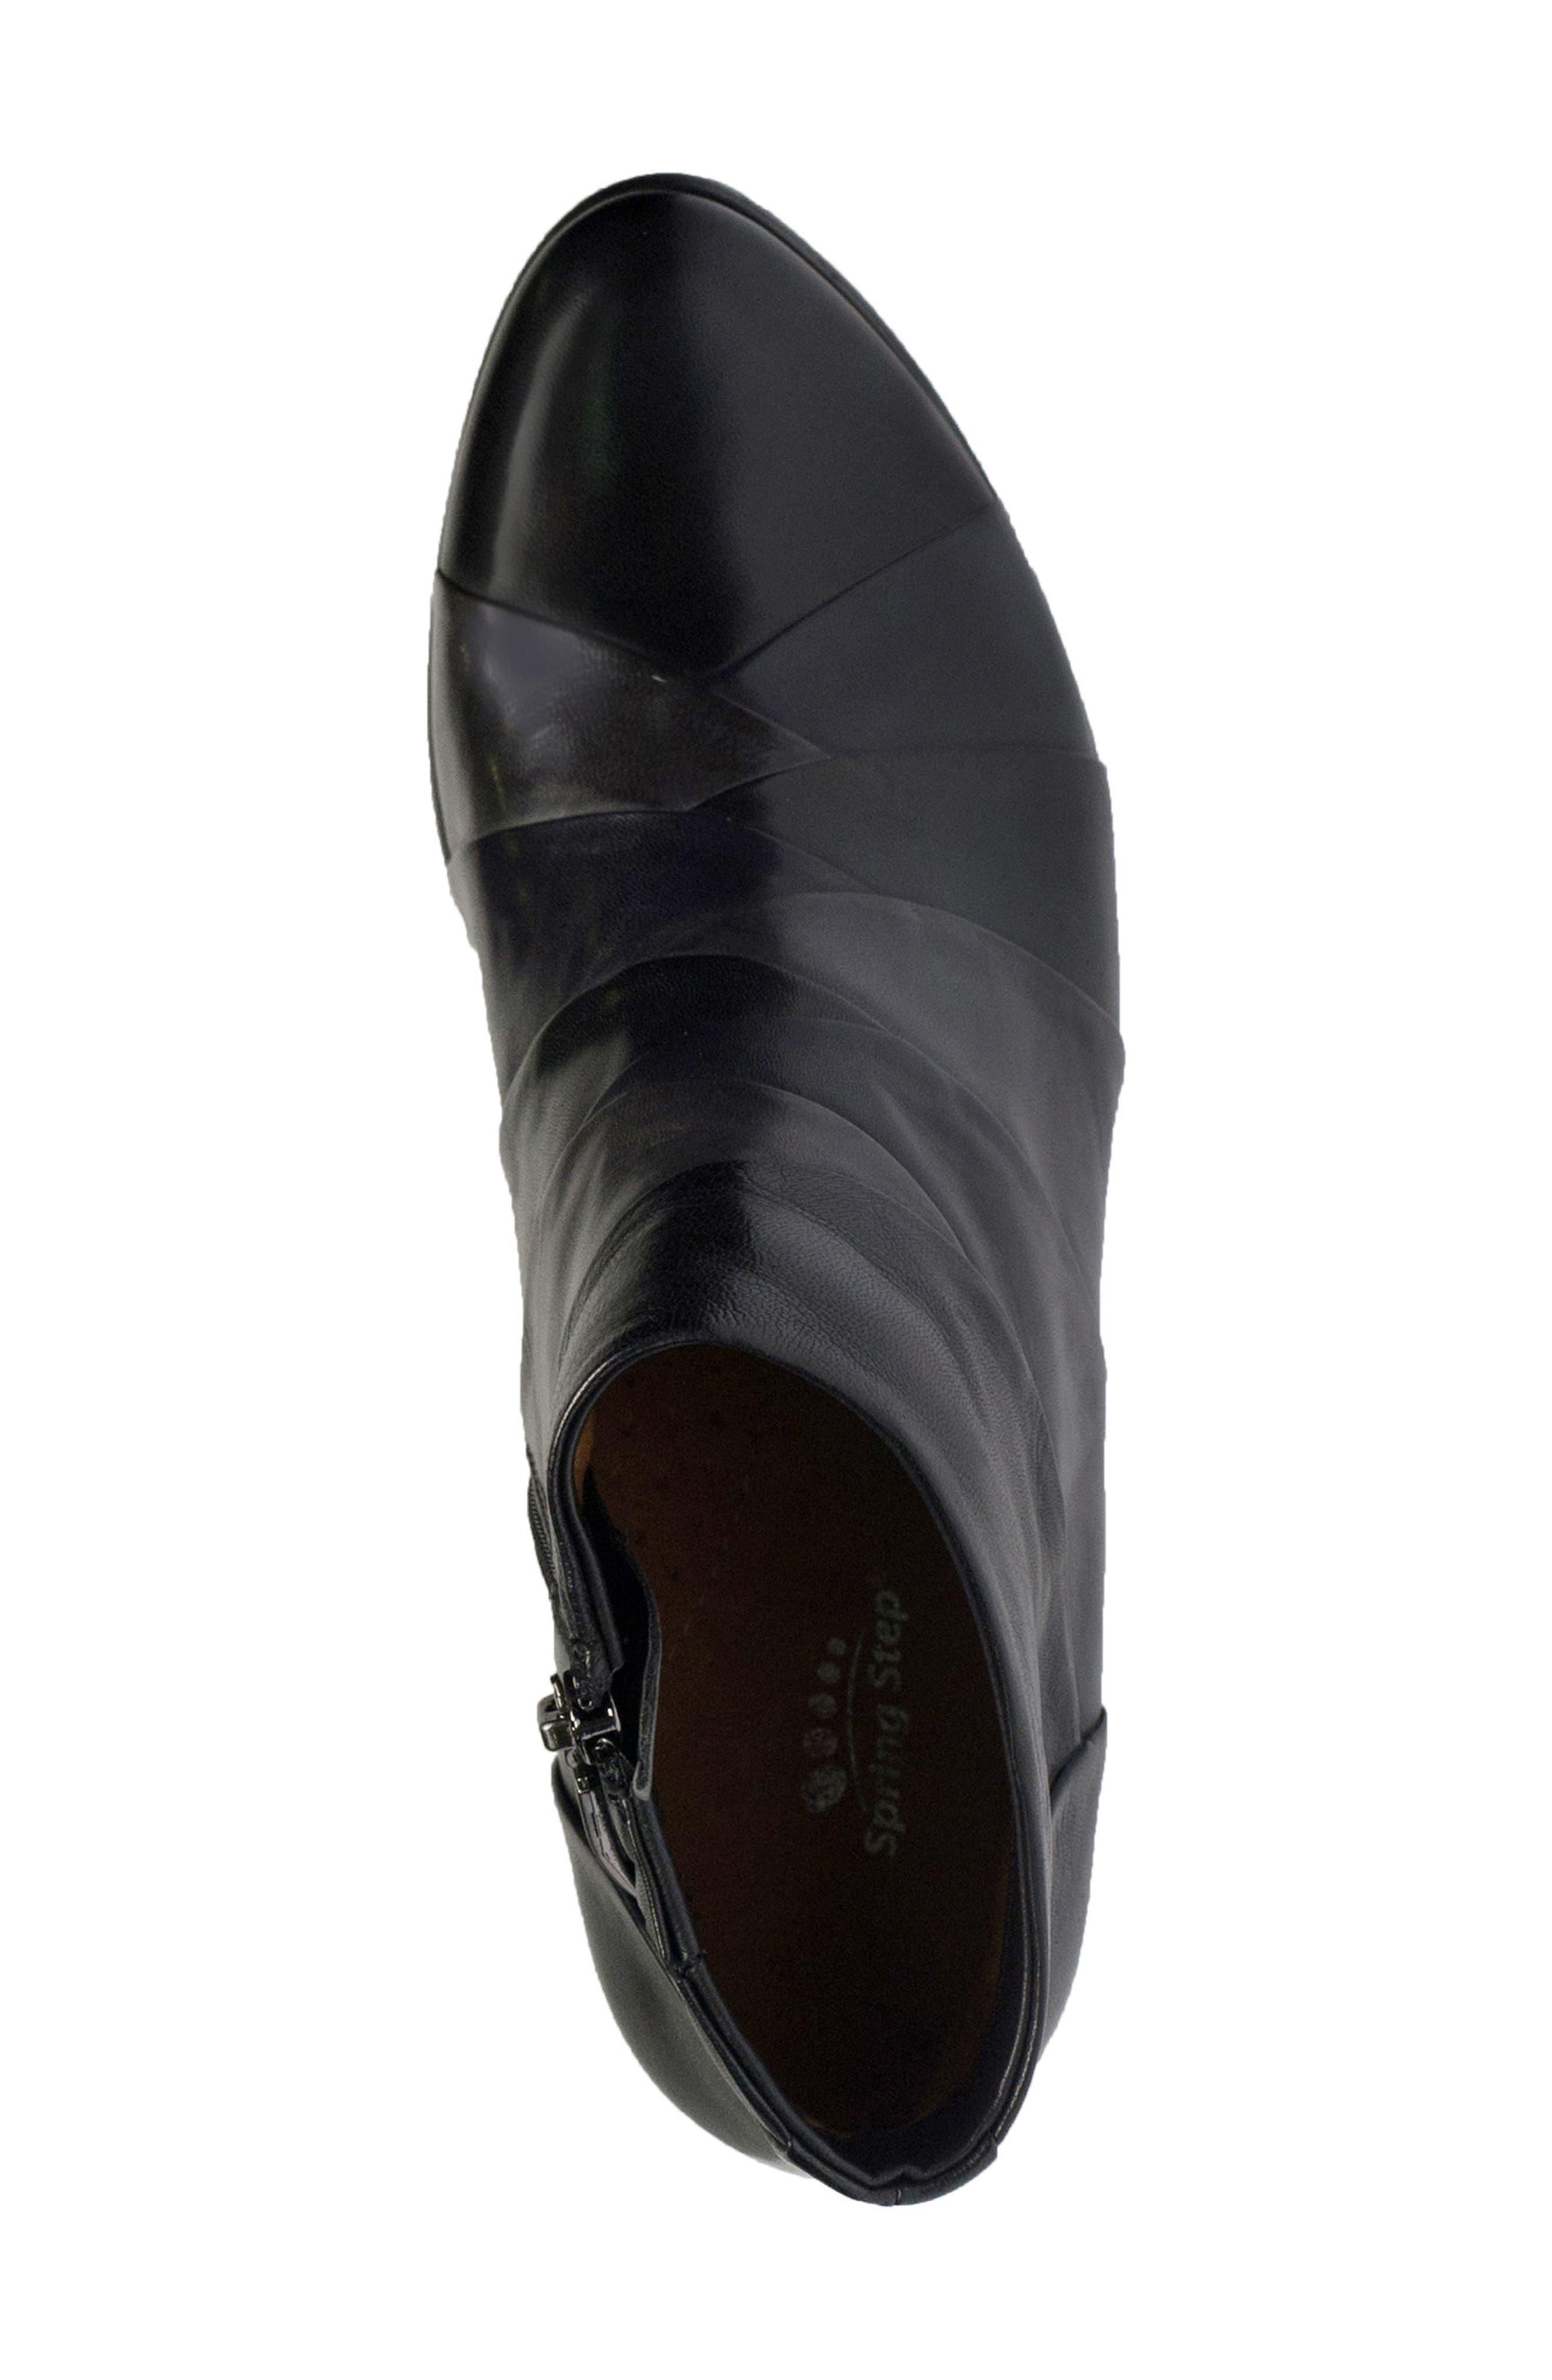 Binzo Bootie,                             Alternate thumbnail 4, color,                             Black Multi Leather